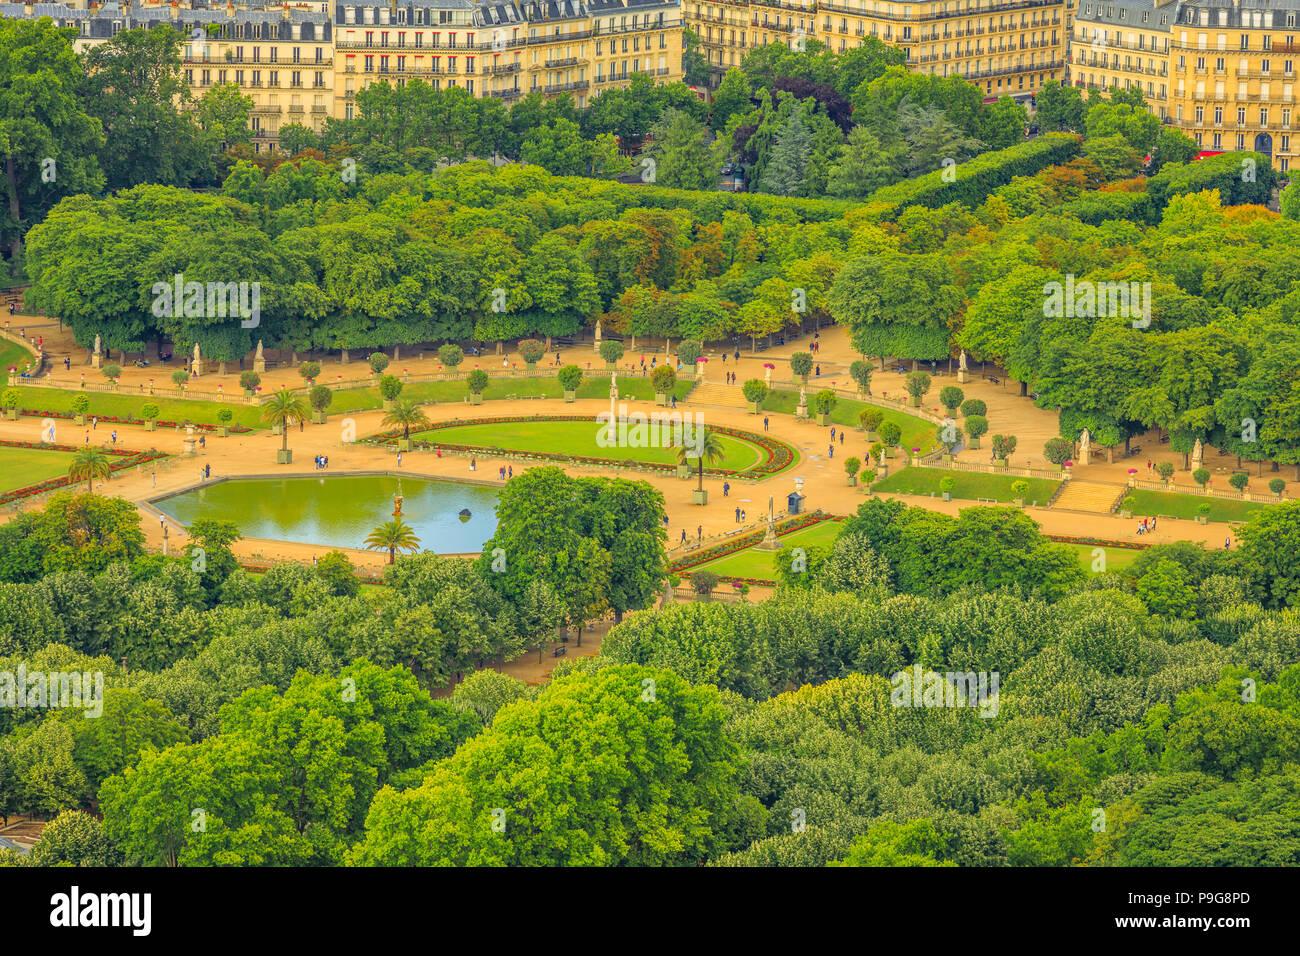 Gros Plan Du Jardin Du Jardin Du Luxembourg A Partir De La Terrasse